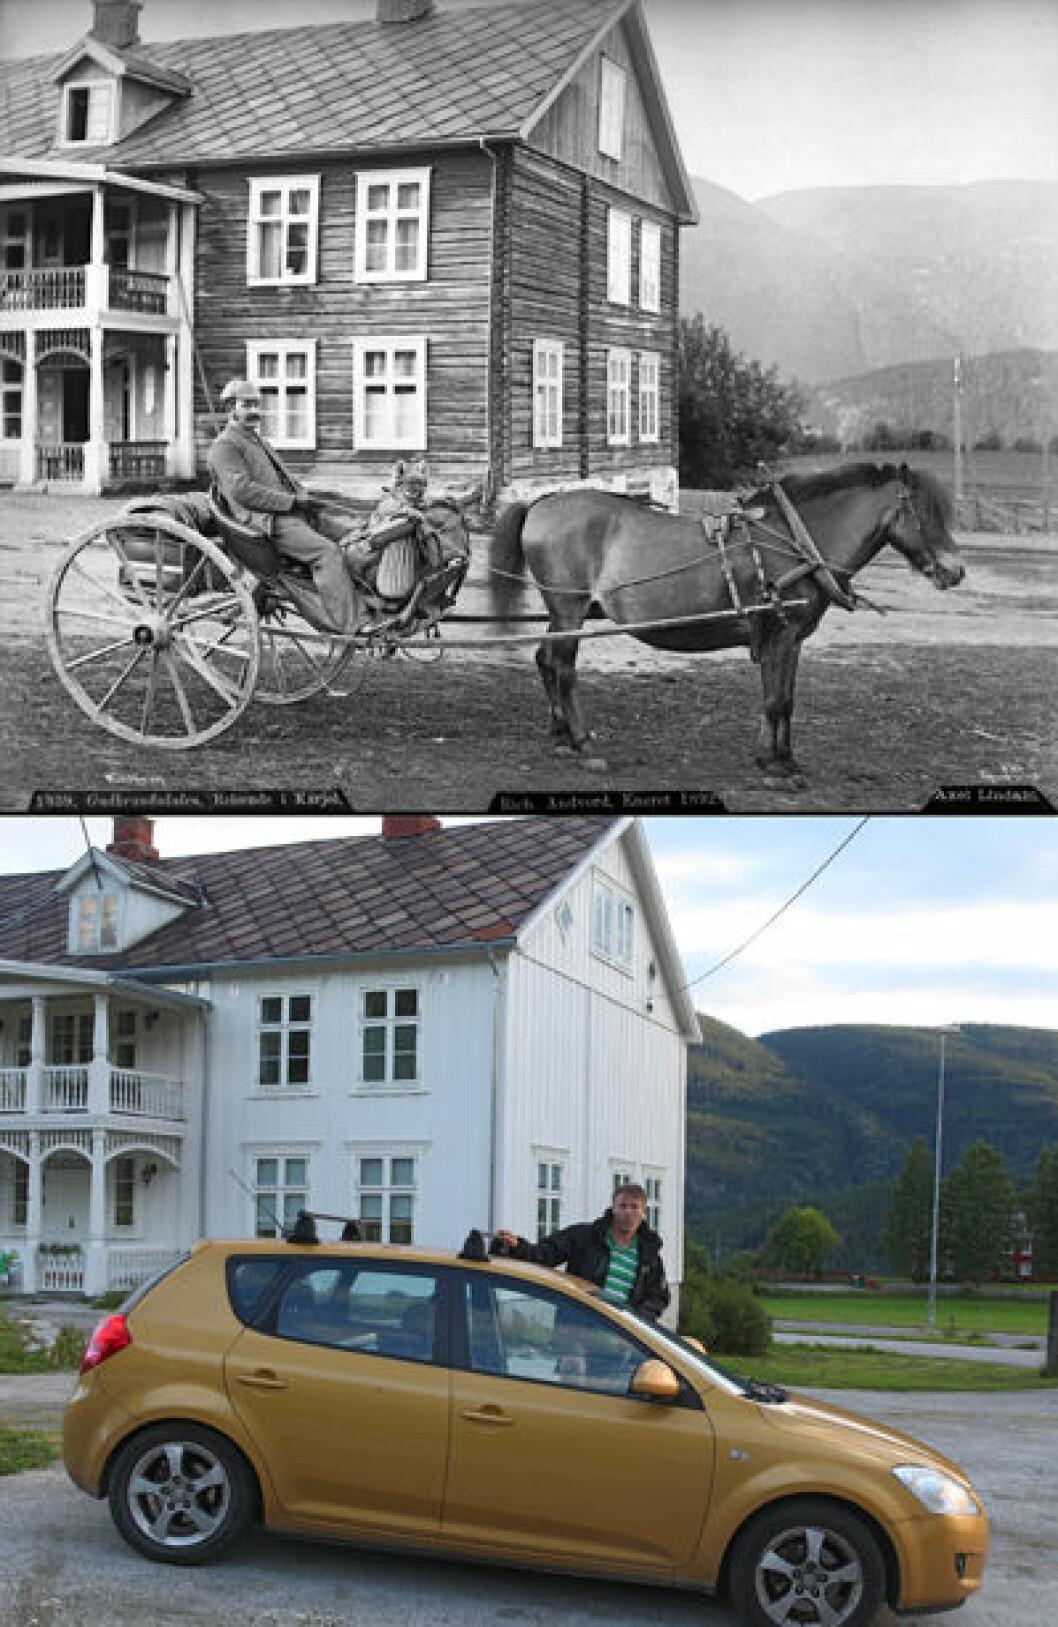 1886 og 2016: Listad i Sør-Fron i Gudbrandsdalen, Oppland. Foto: Axel Lindahl/Oscar Puschmann